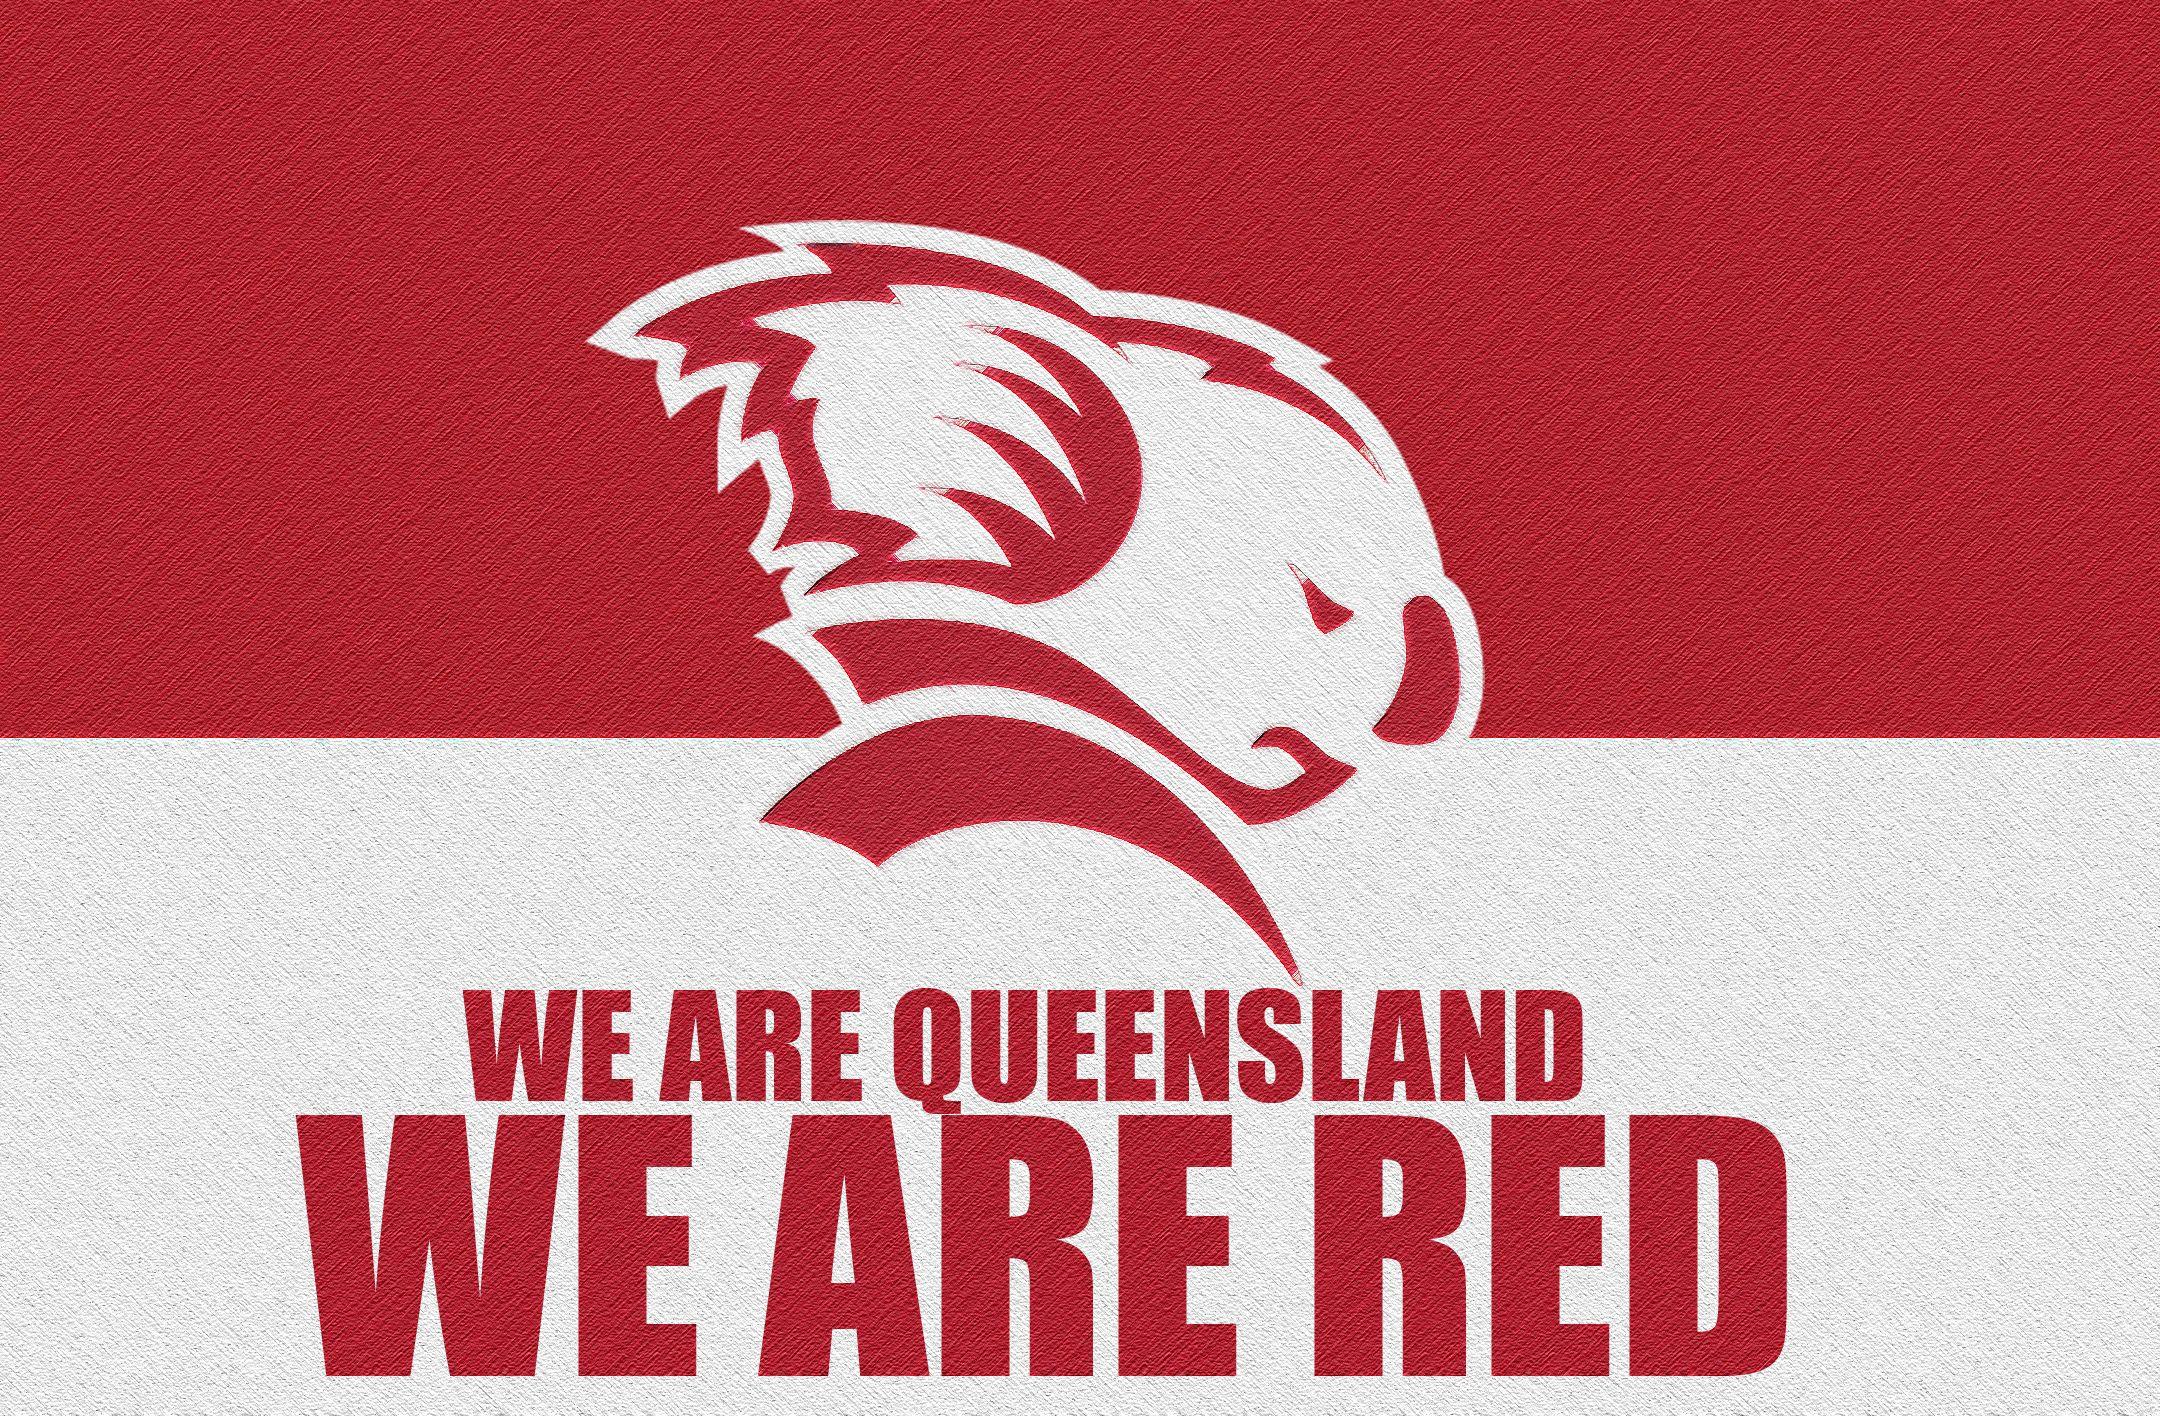 Queensland Reds Flagstyle Wallpaper V2 By Sunnyboiiii Red Queensland Wallpaper